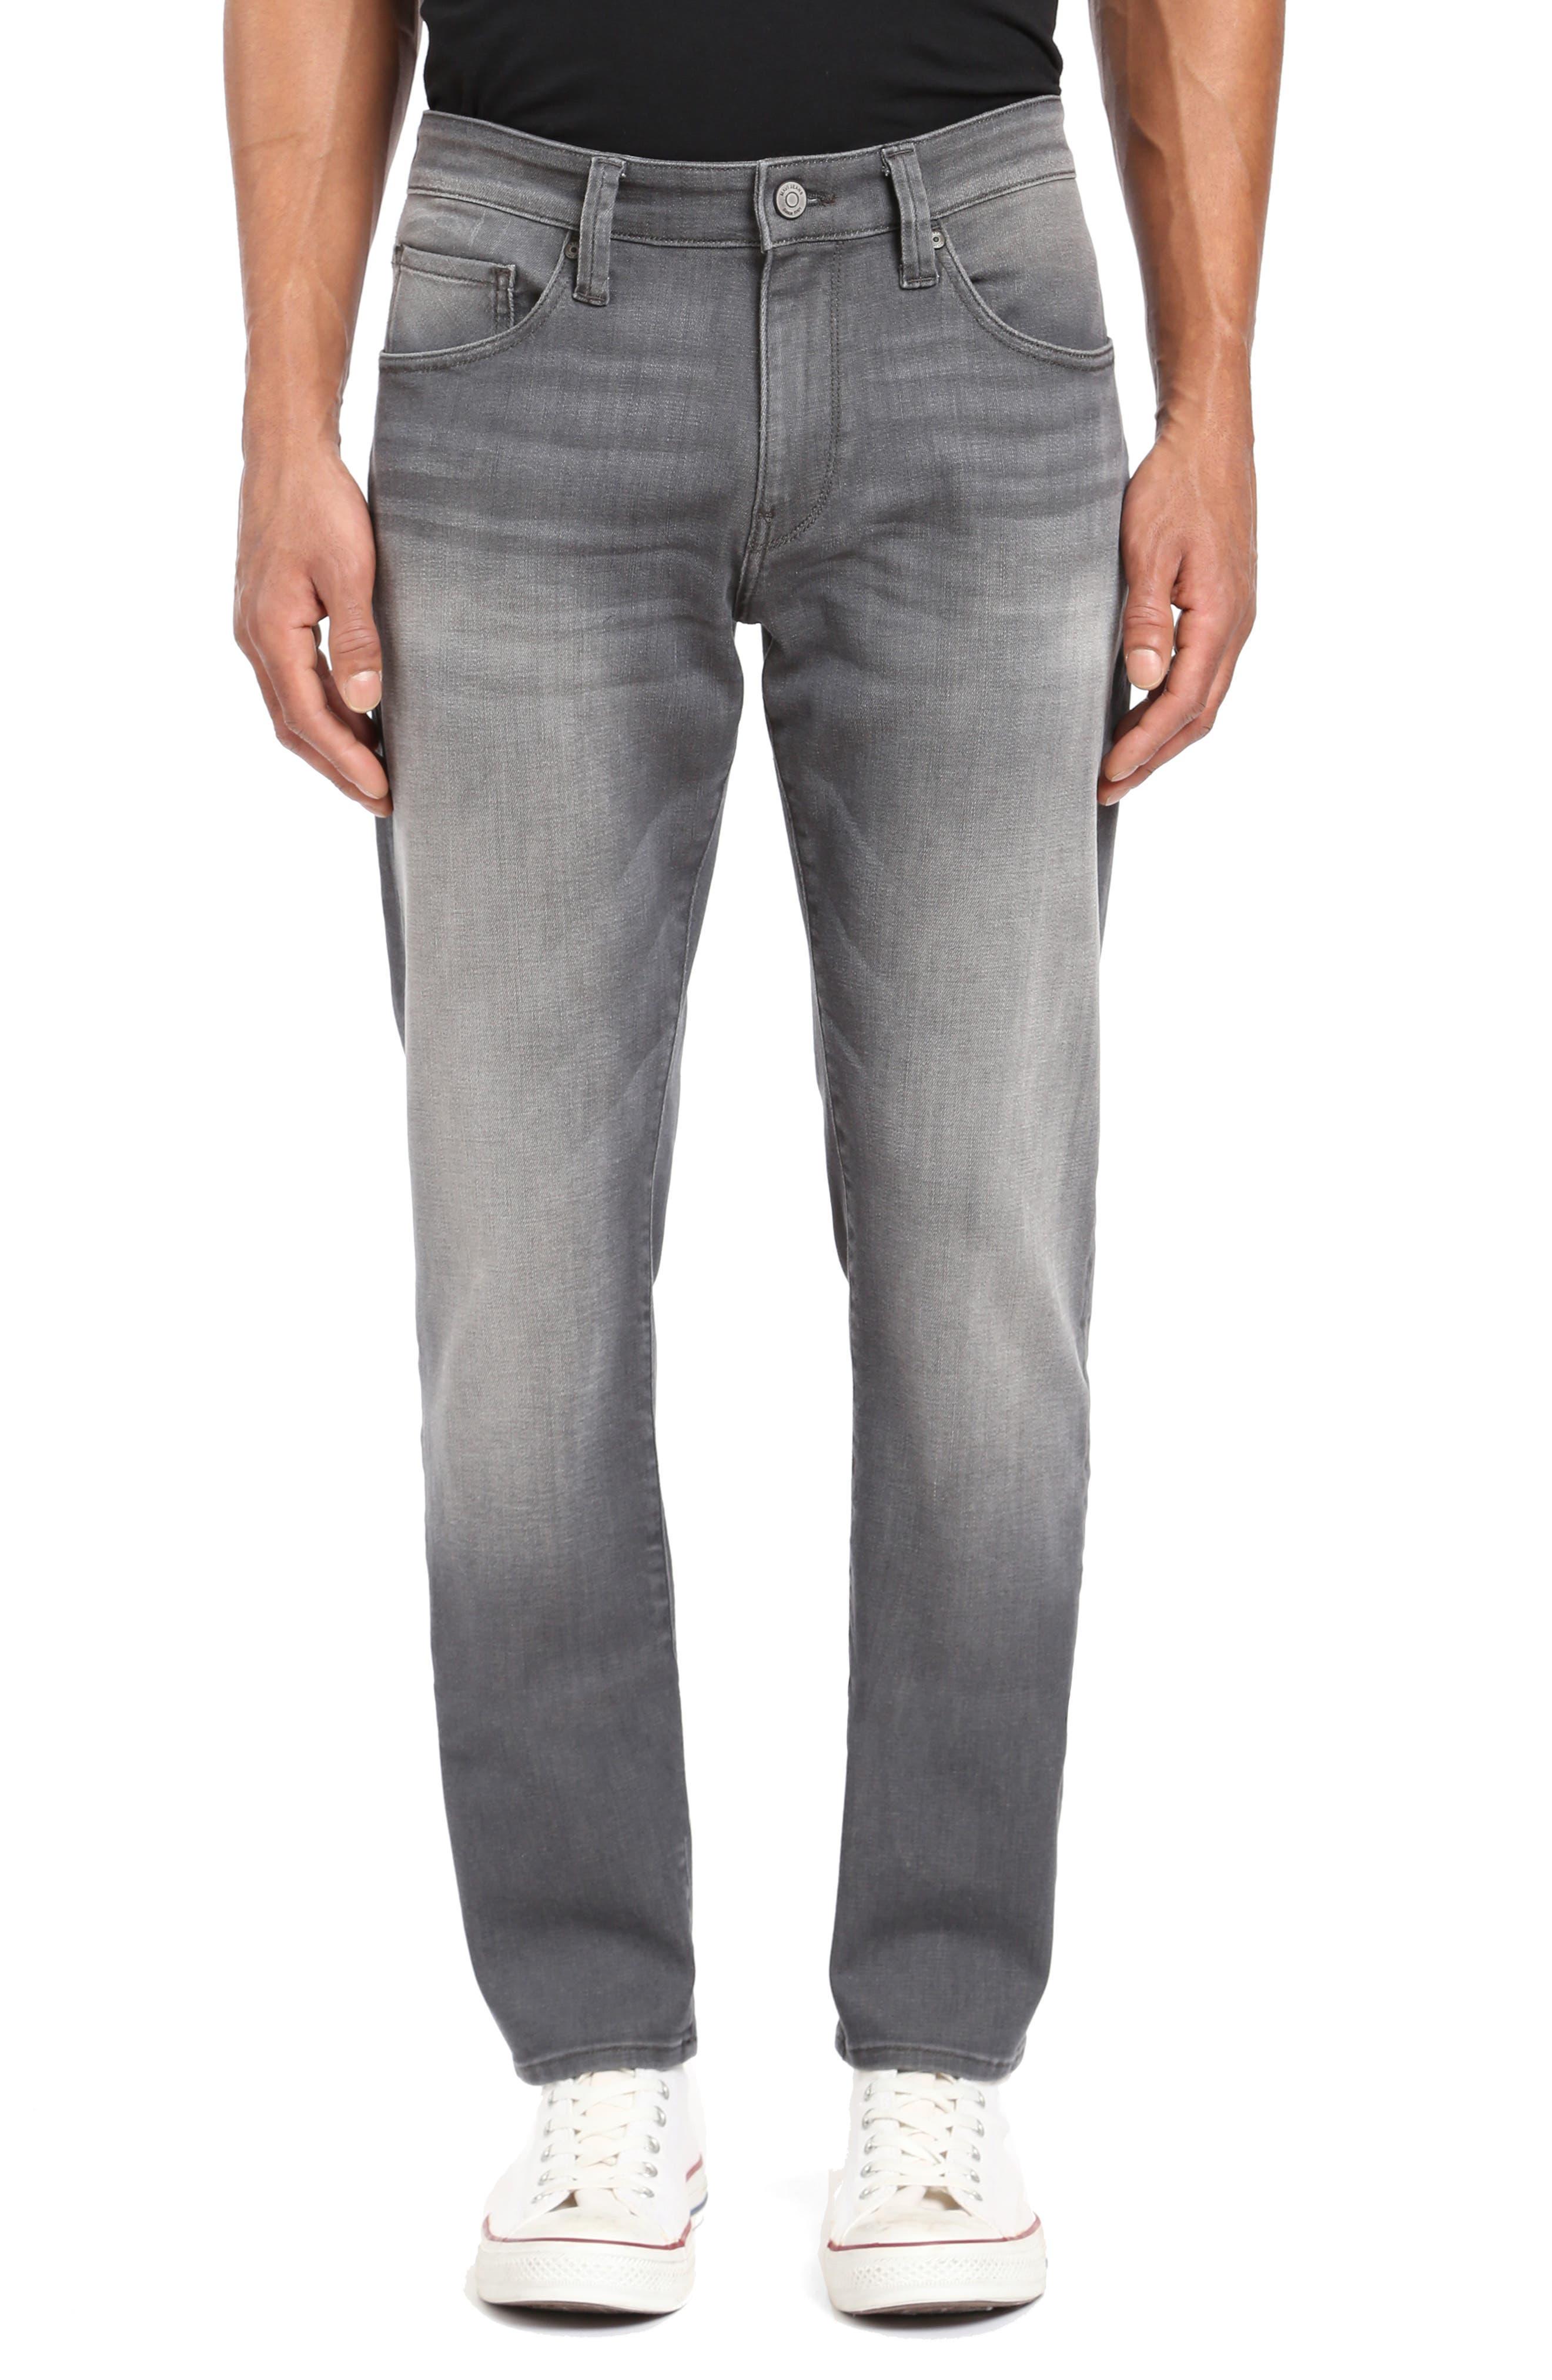 Zach Straight Leg Jeans,                             Main thumbnail 1, color,                             LIGHT GREY BROOKLYN